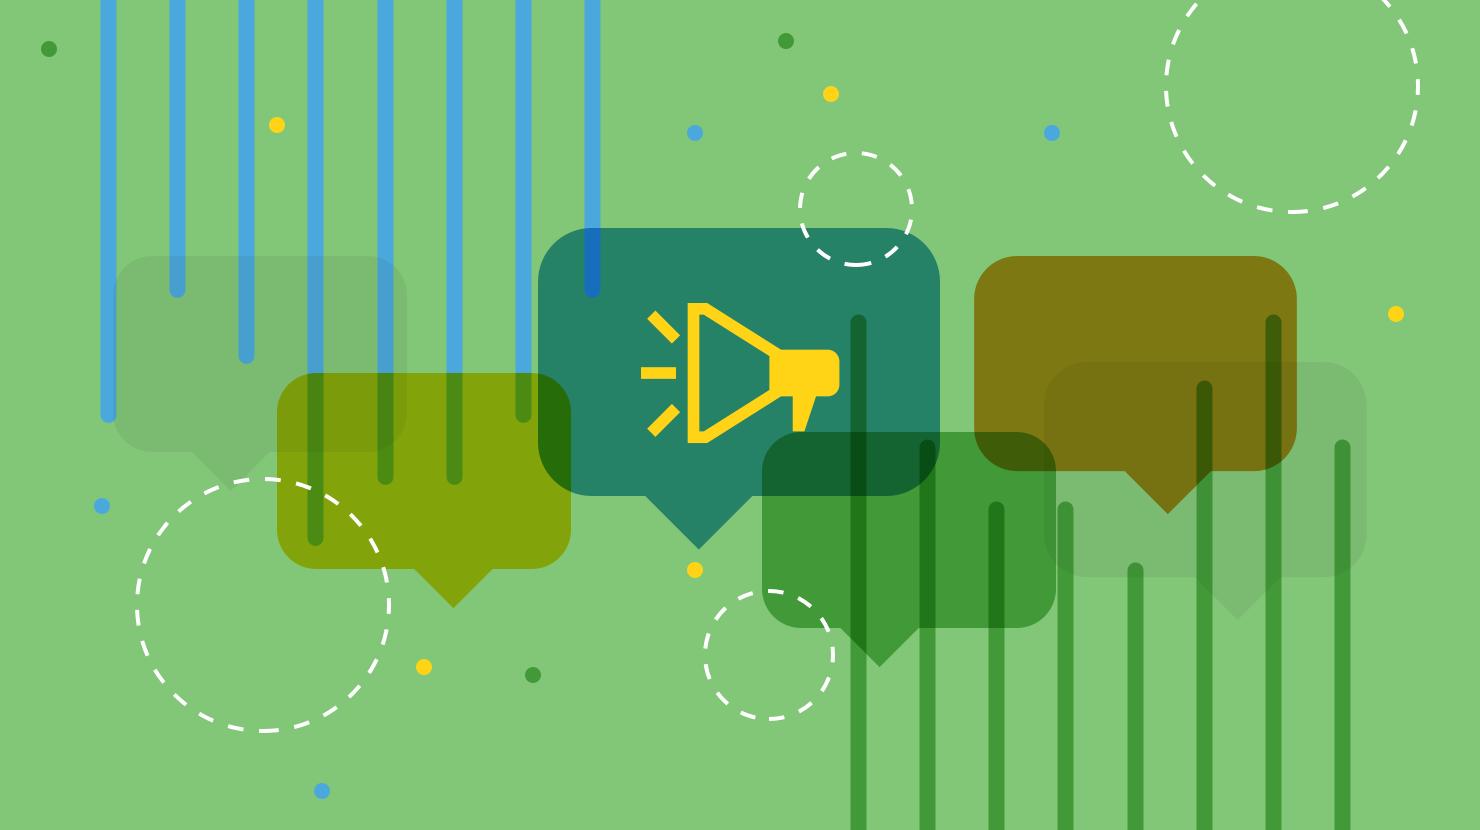 7-ways-to-improve-team-communciation16x9.png